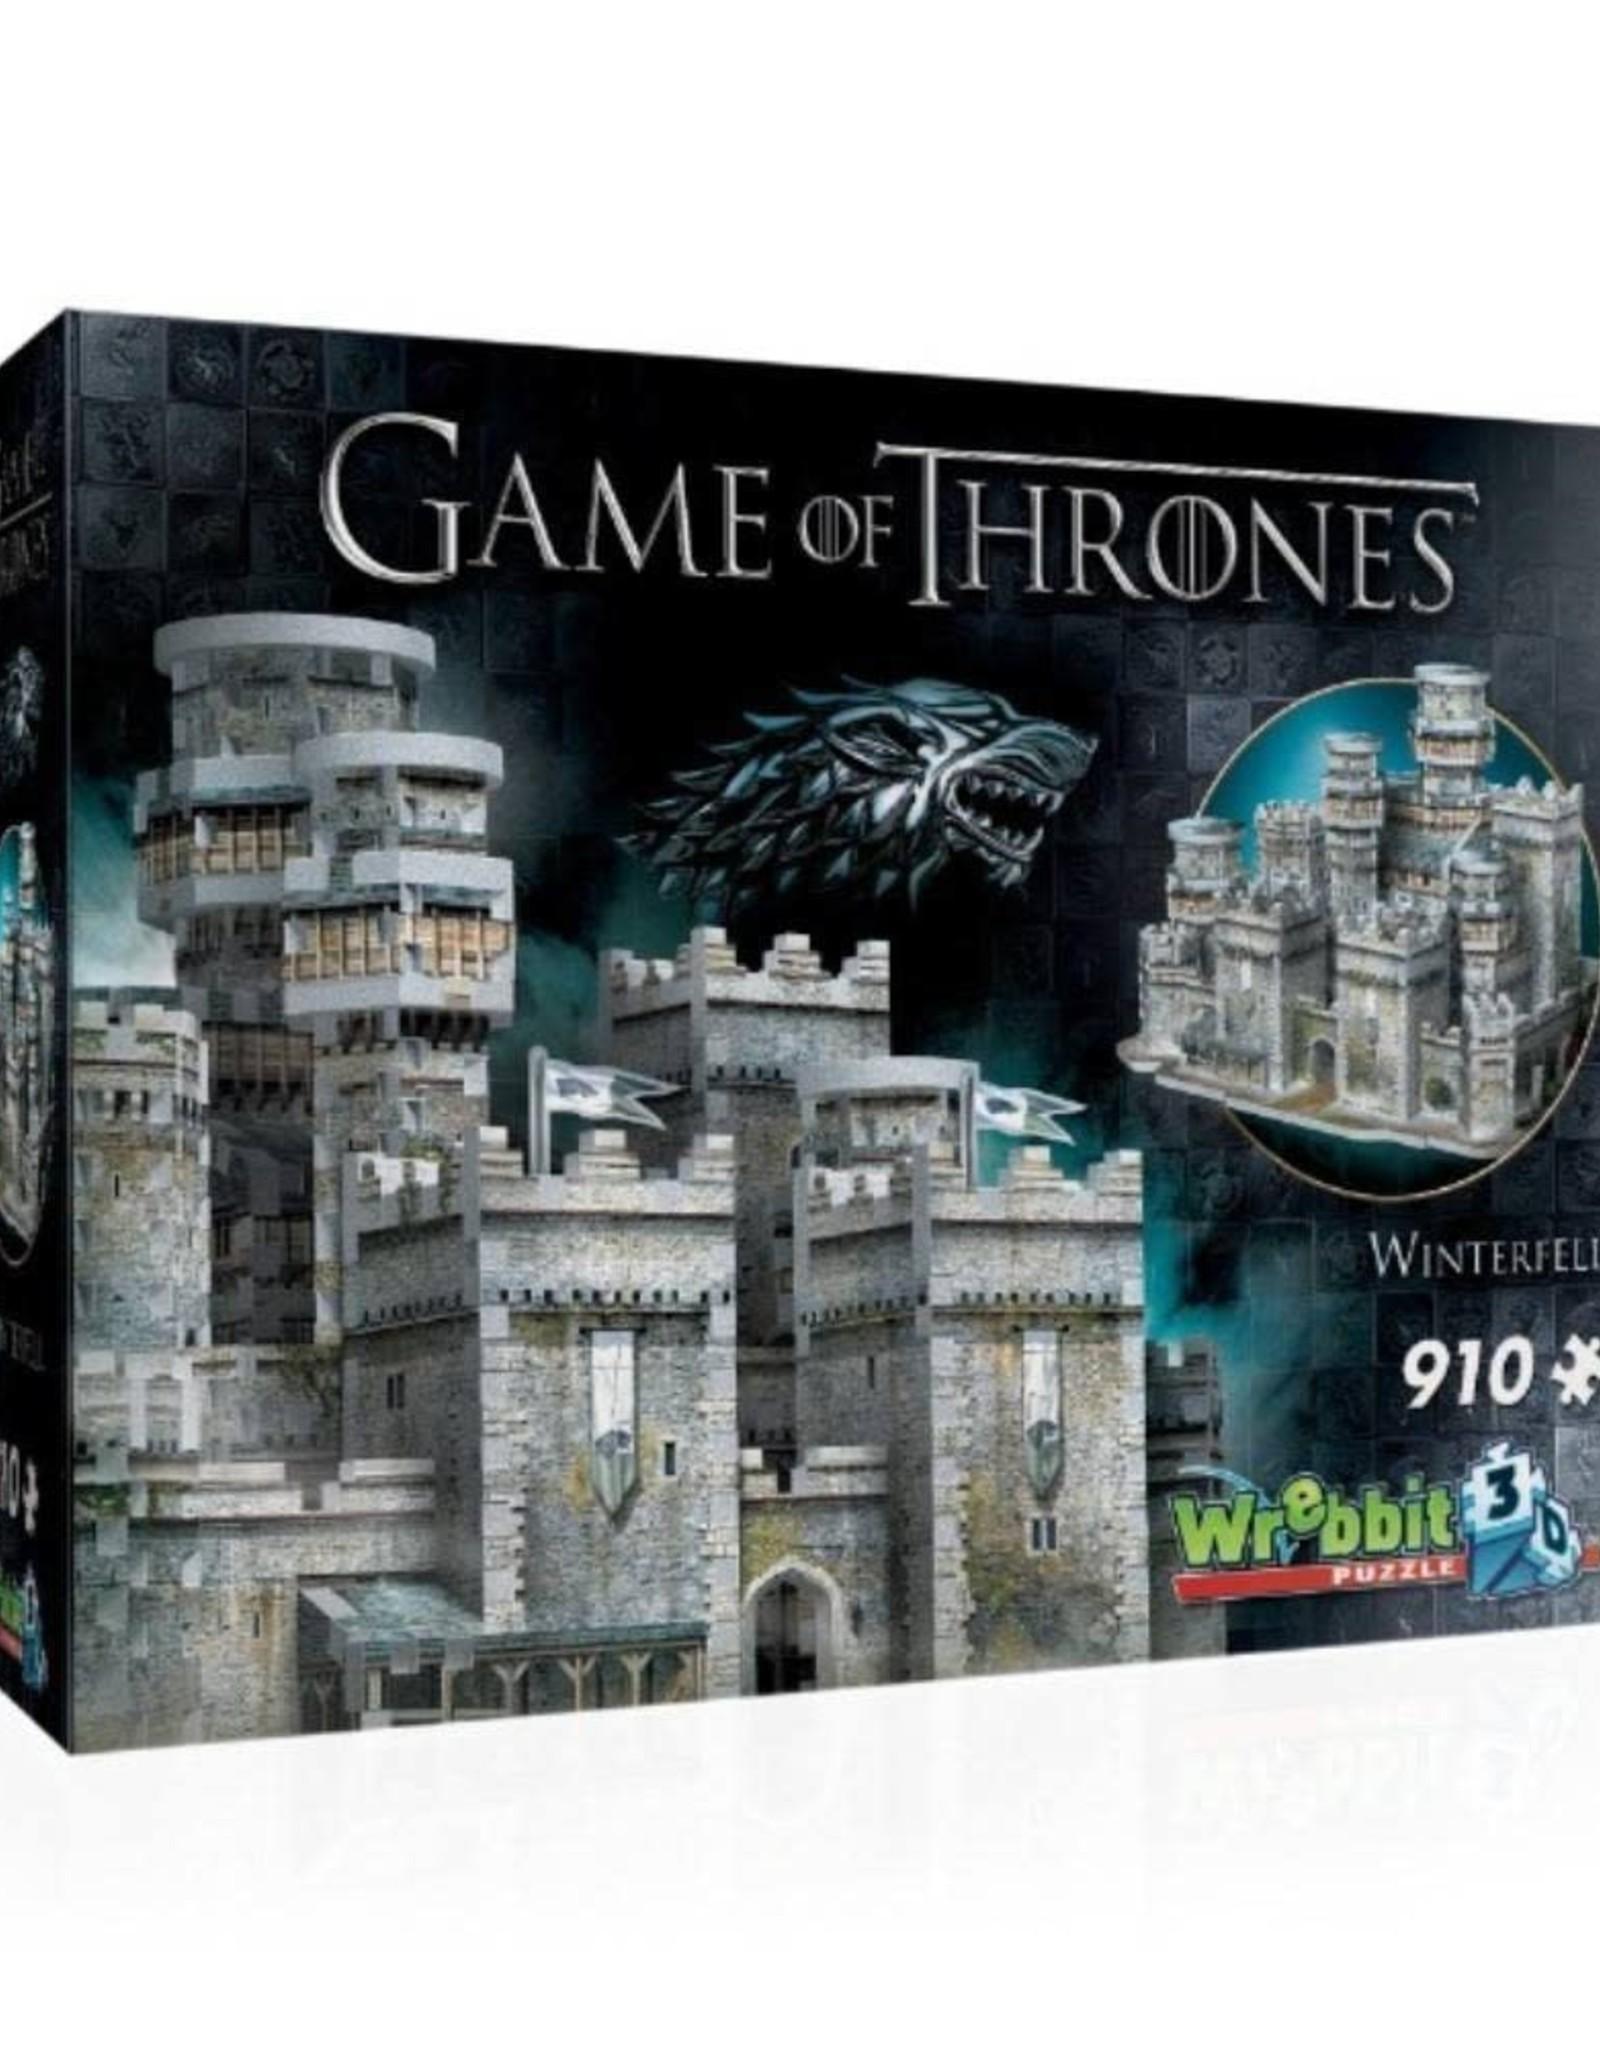 Wrebbit Puzzles Puzzles: Winterfell